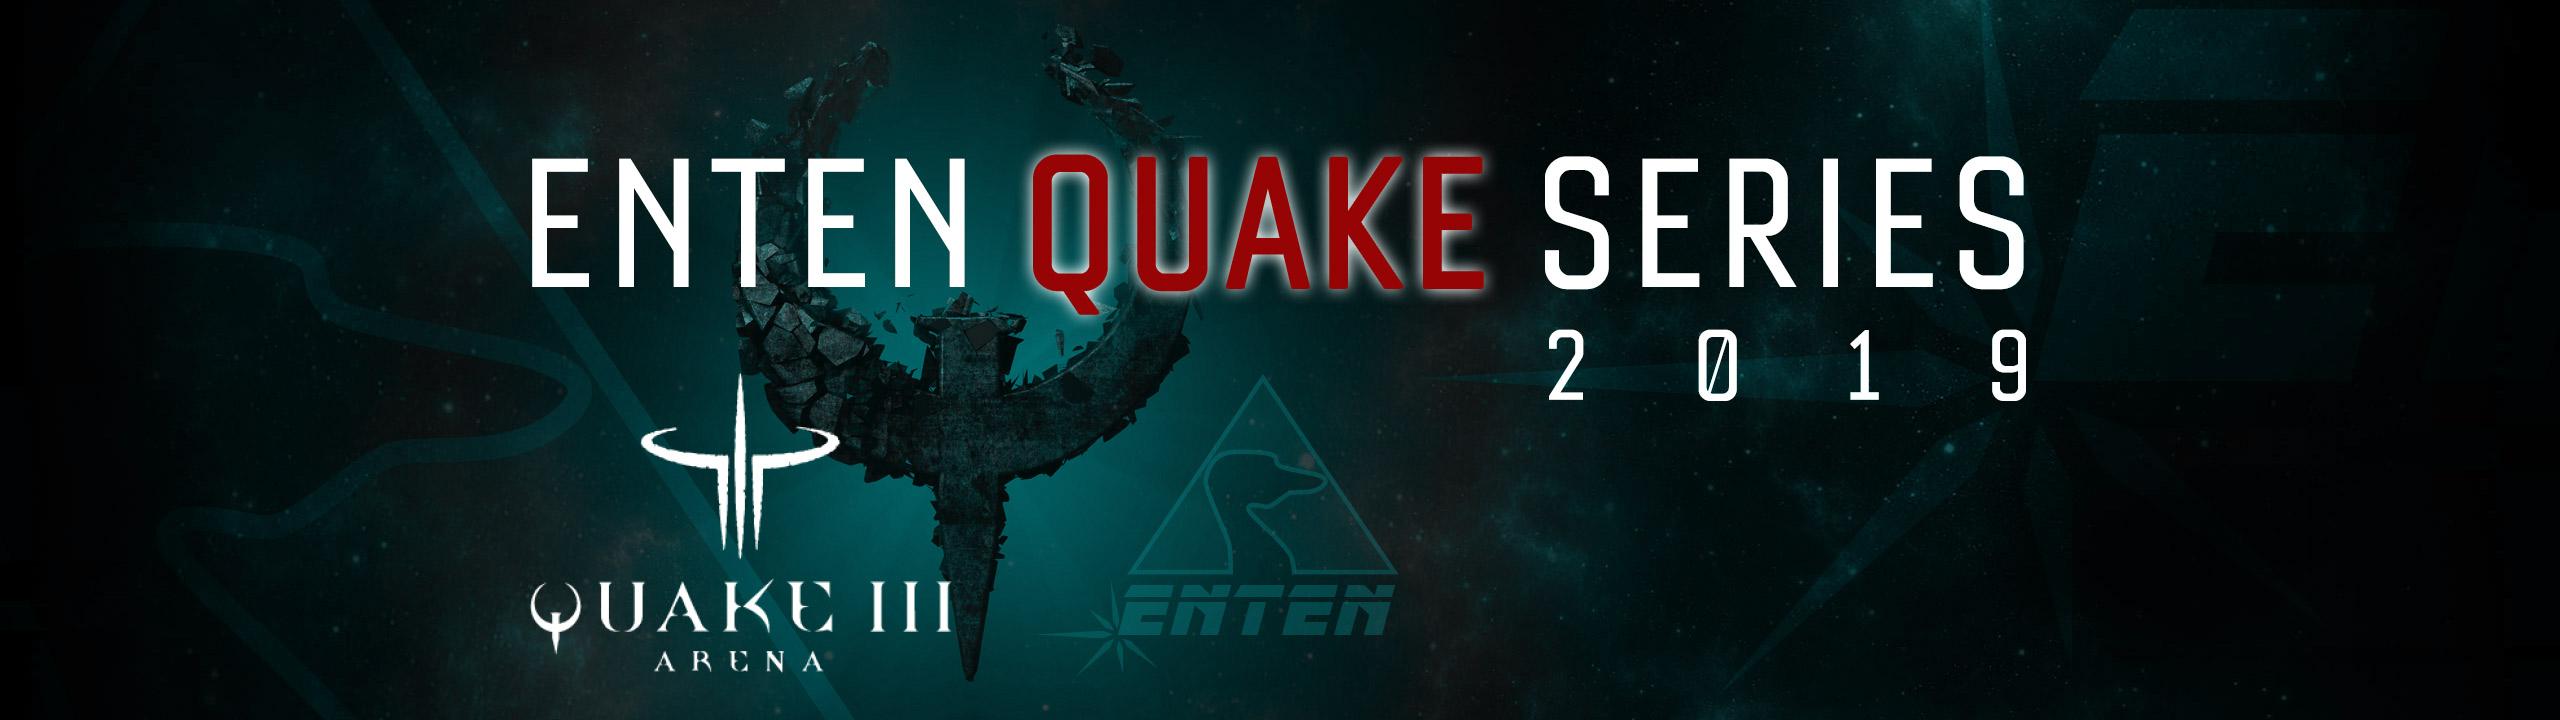 Enten Quake Series